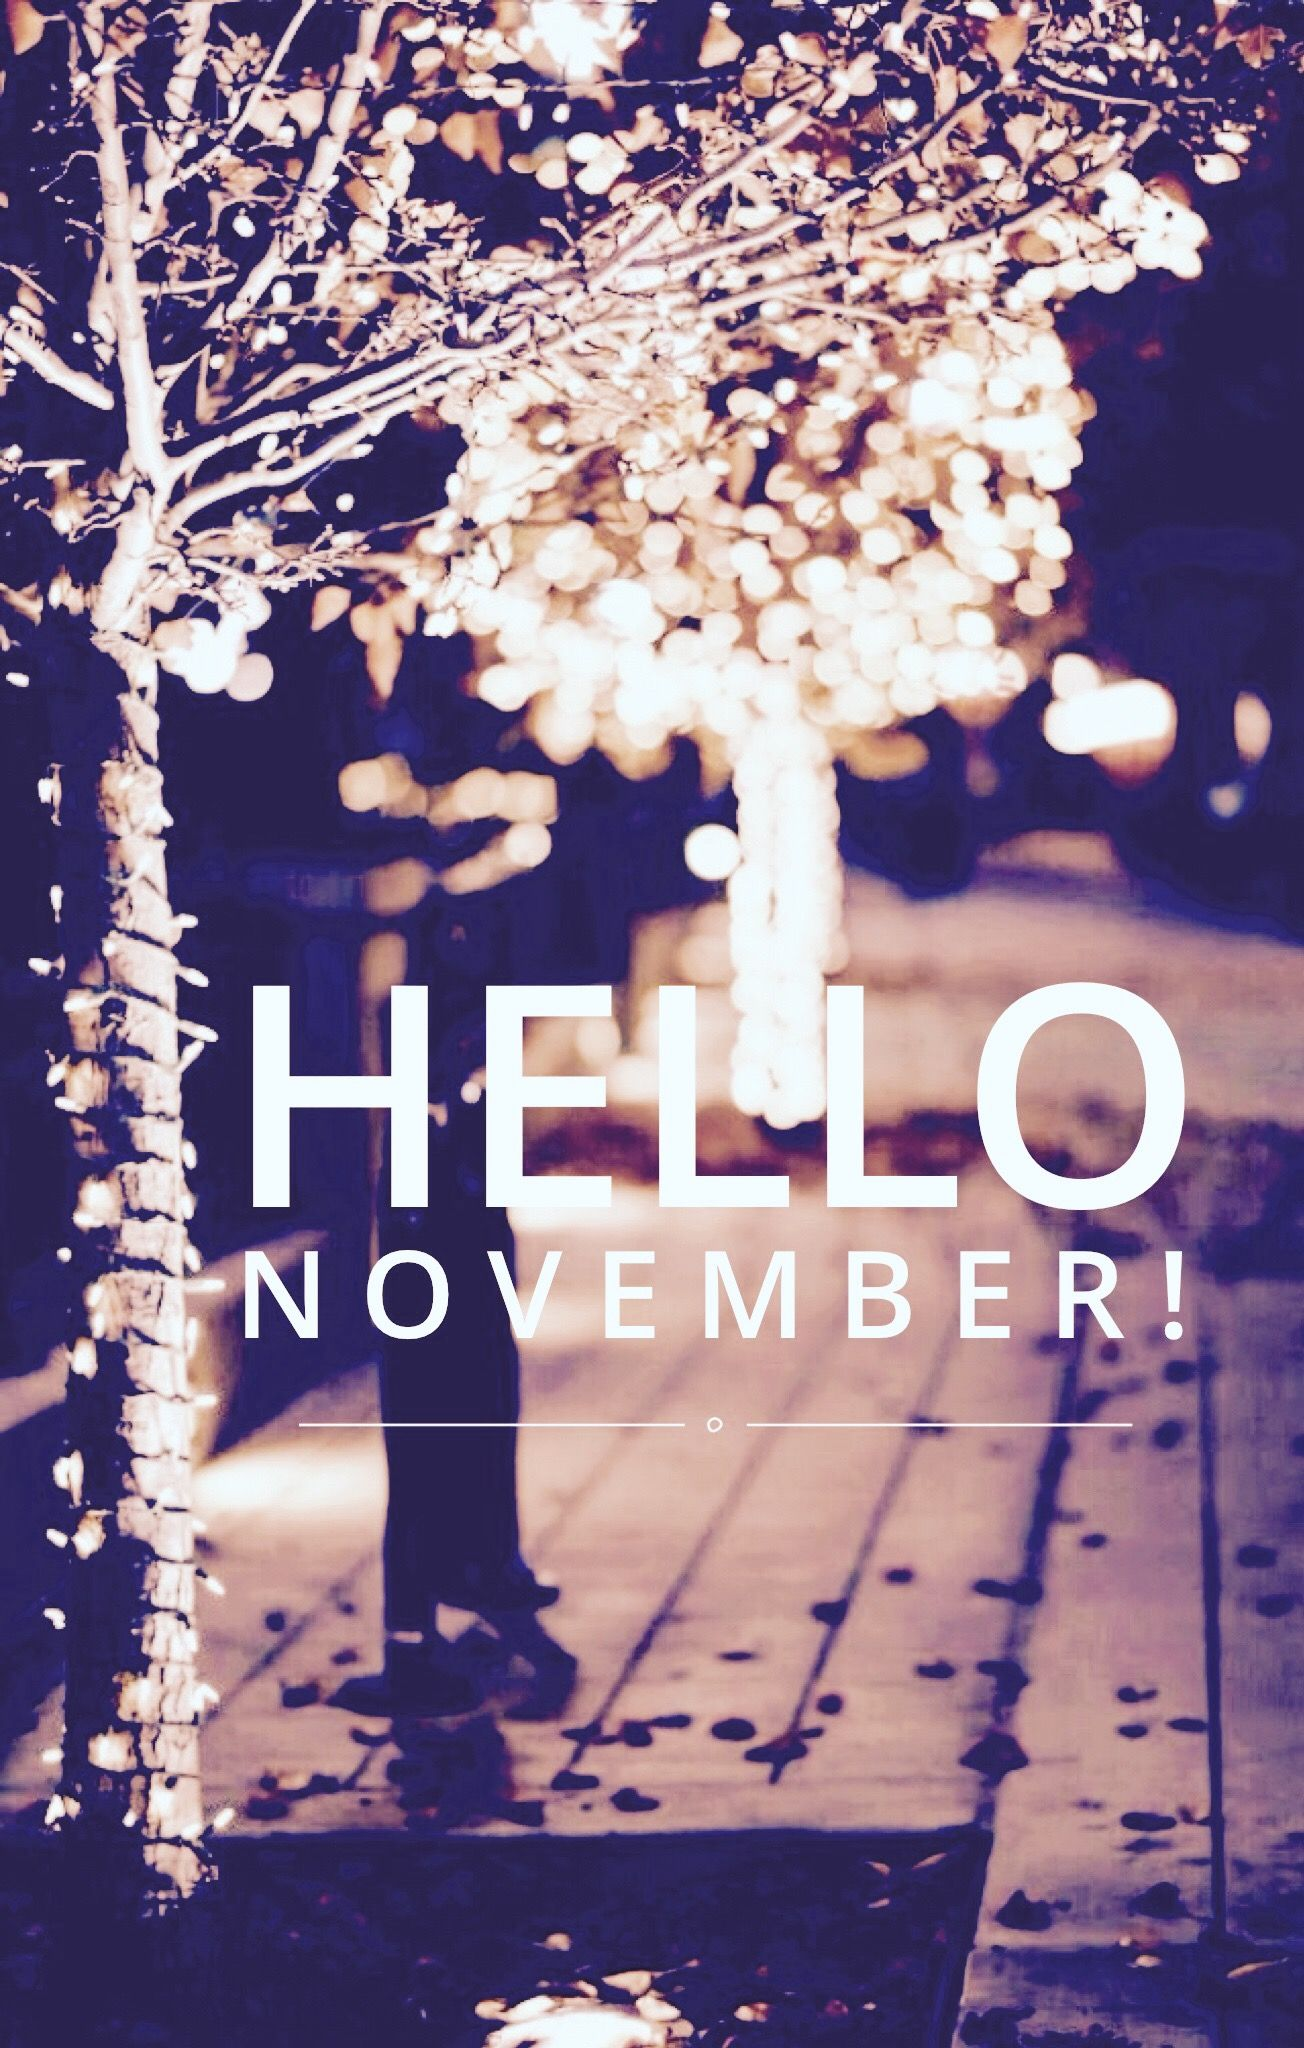 New iPhone 6 Tumblr Background 2016 (hello November